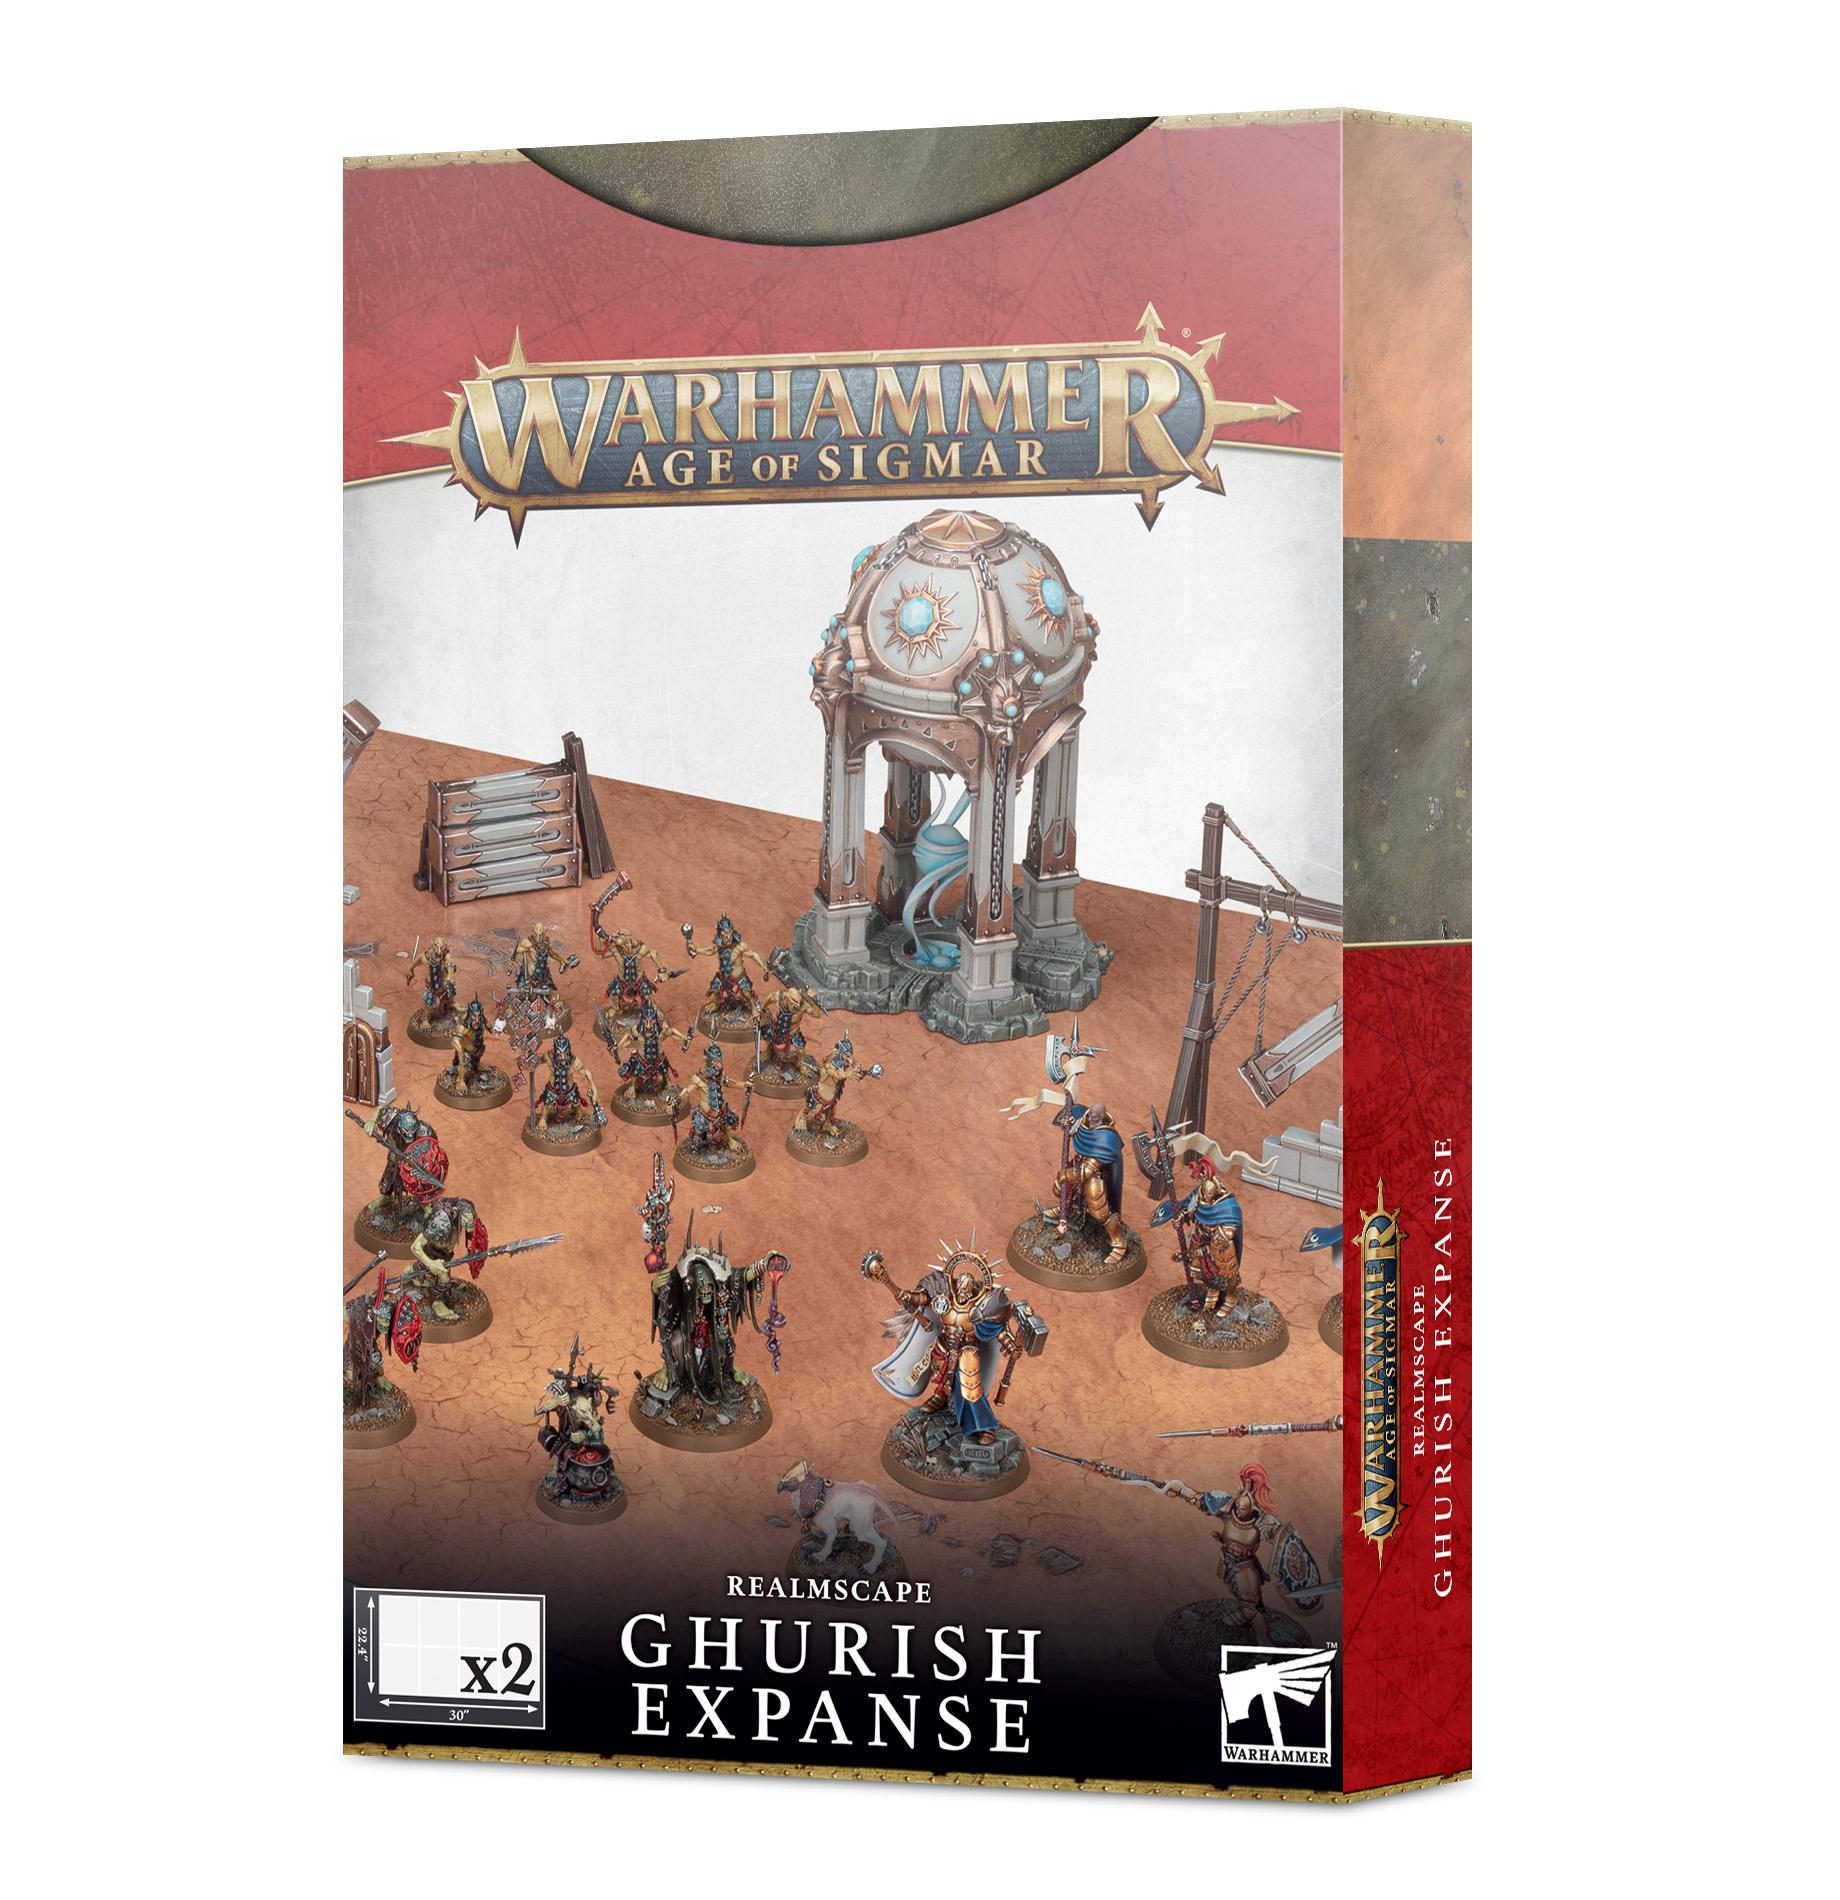 Games-Workshop Realmscape: Ghurish Expanse